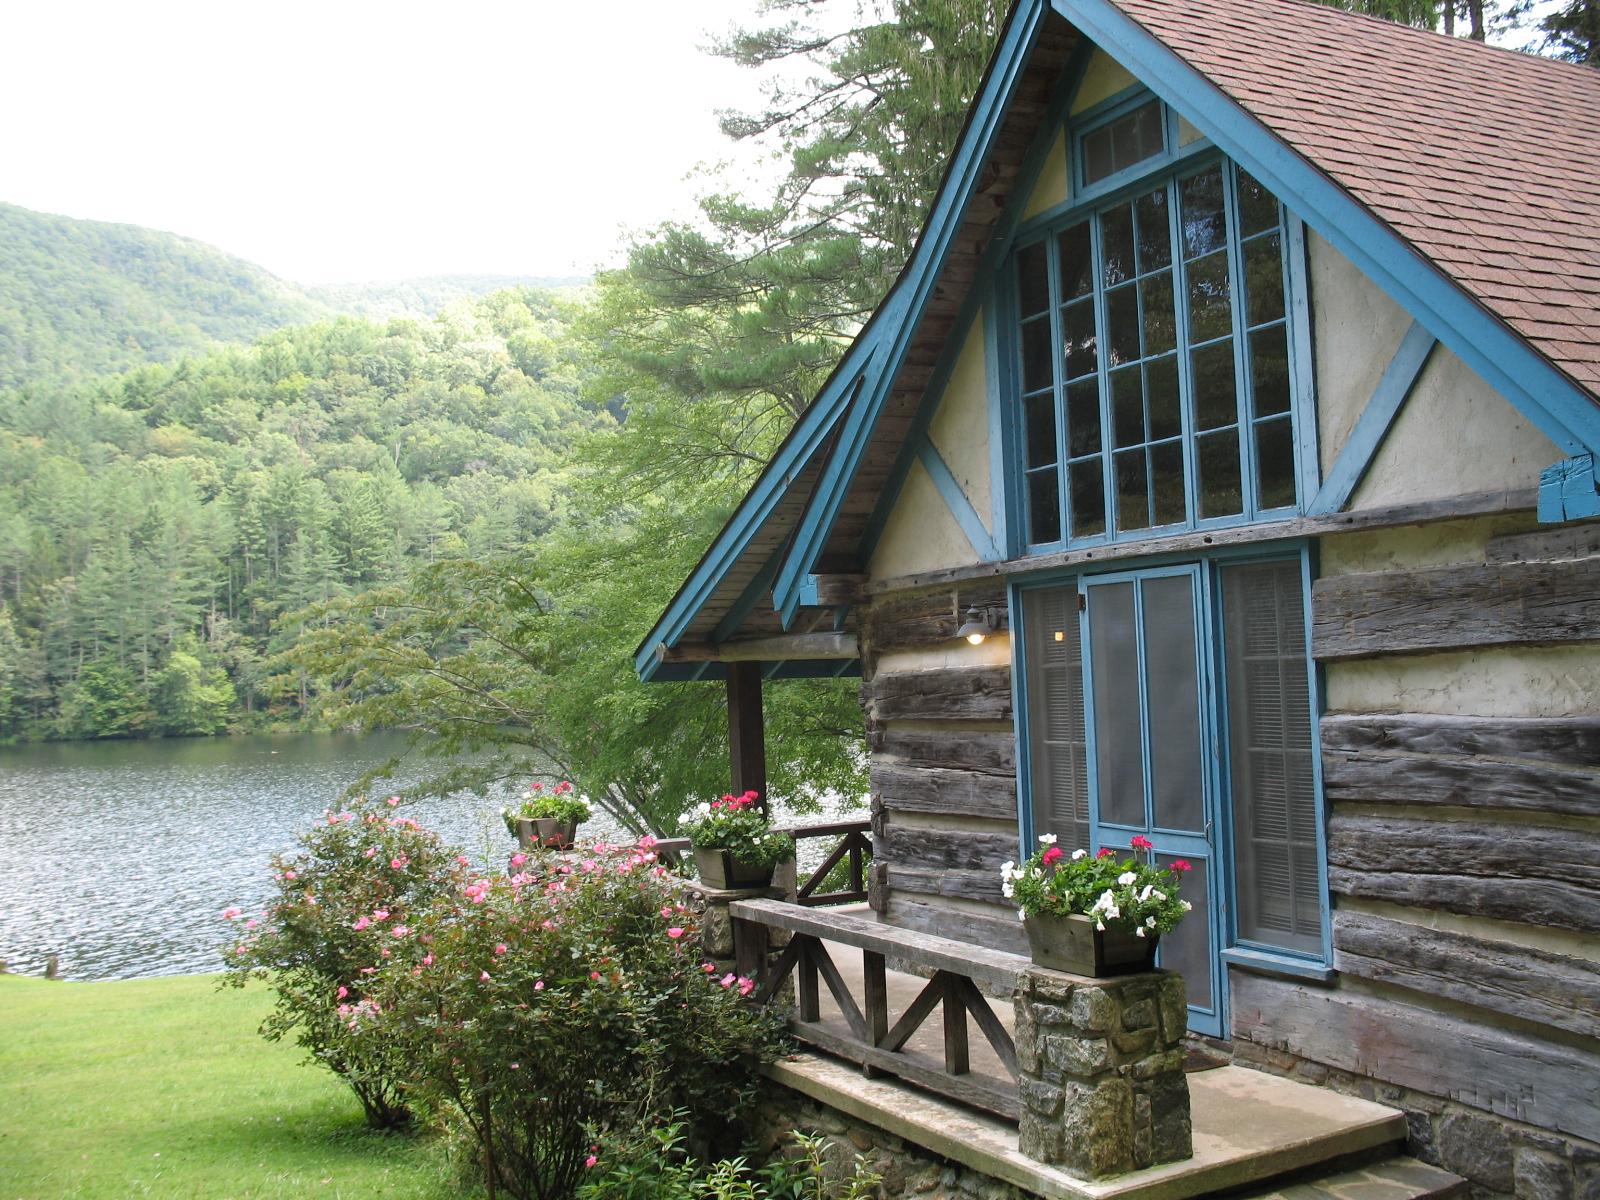 Rhododendron_retreat_cabin.jpg